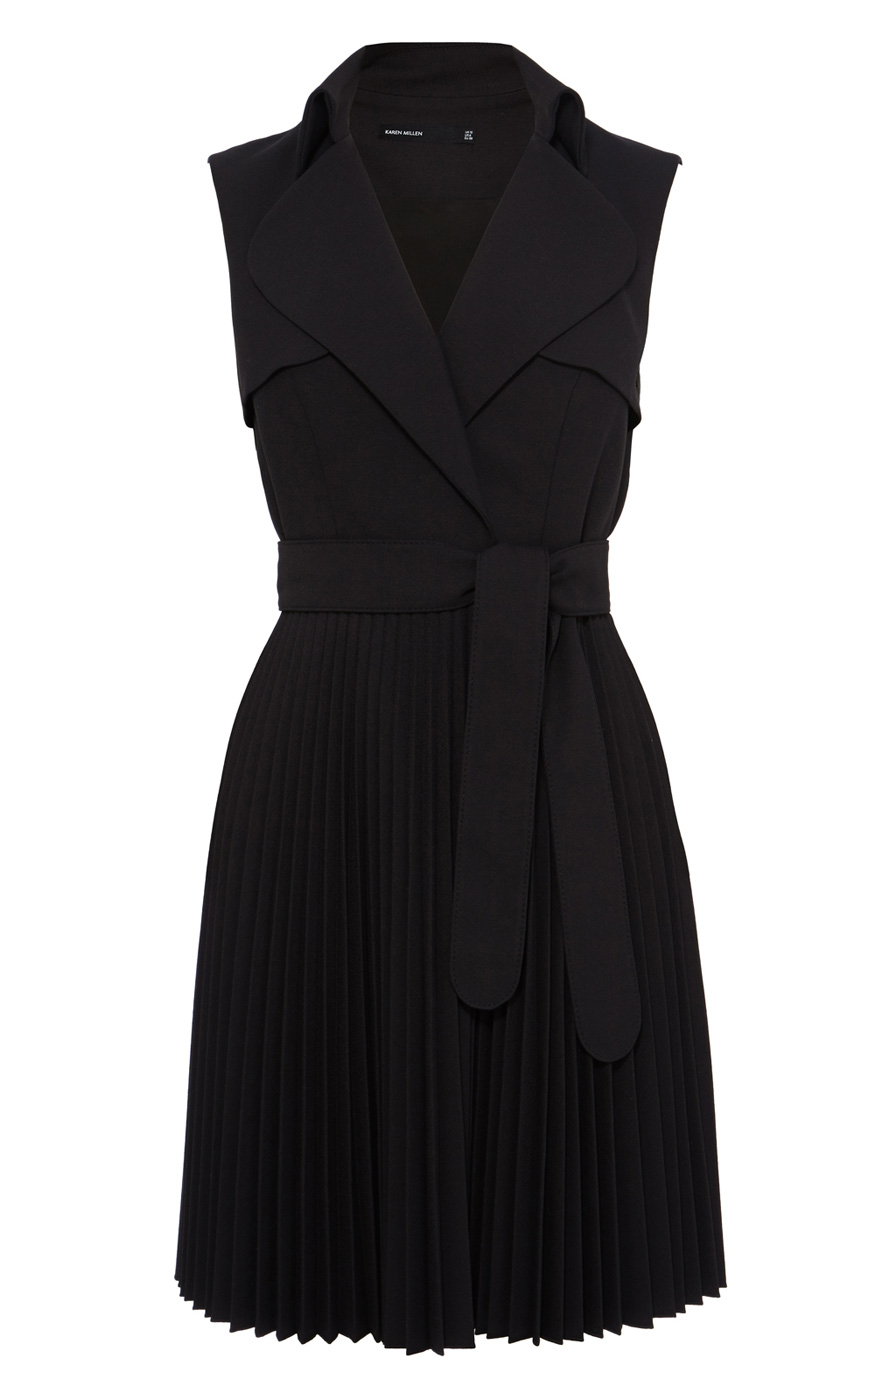 Karen Millen Belted Trench Dress In Black Lyst